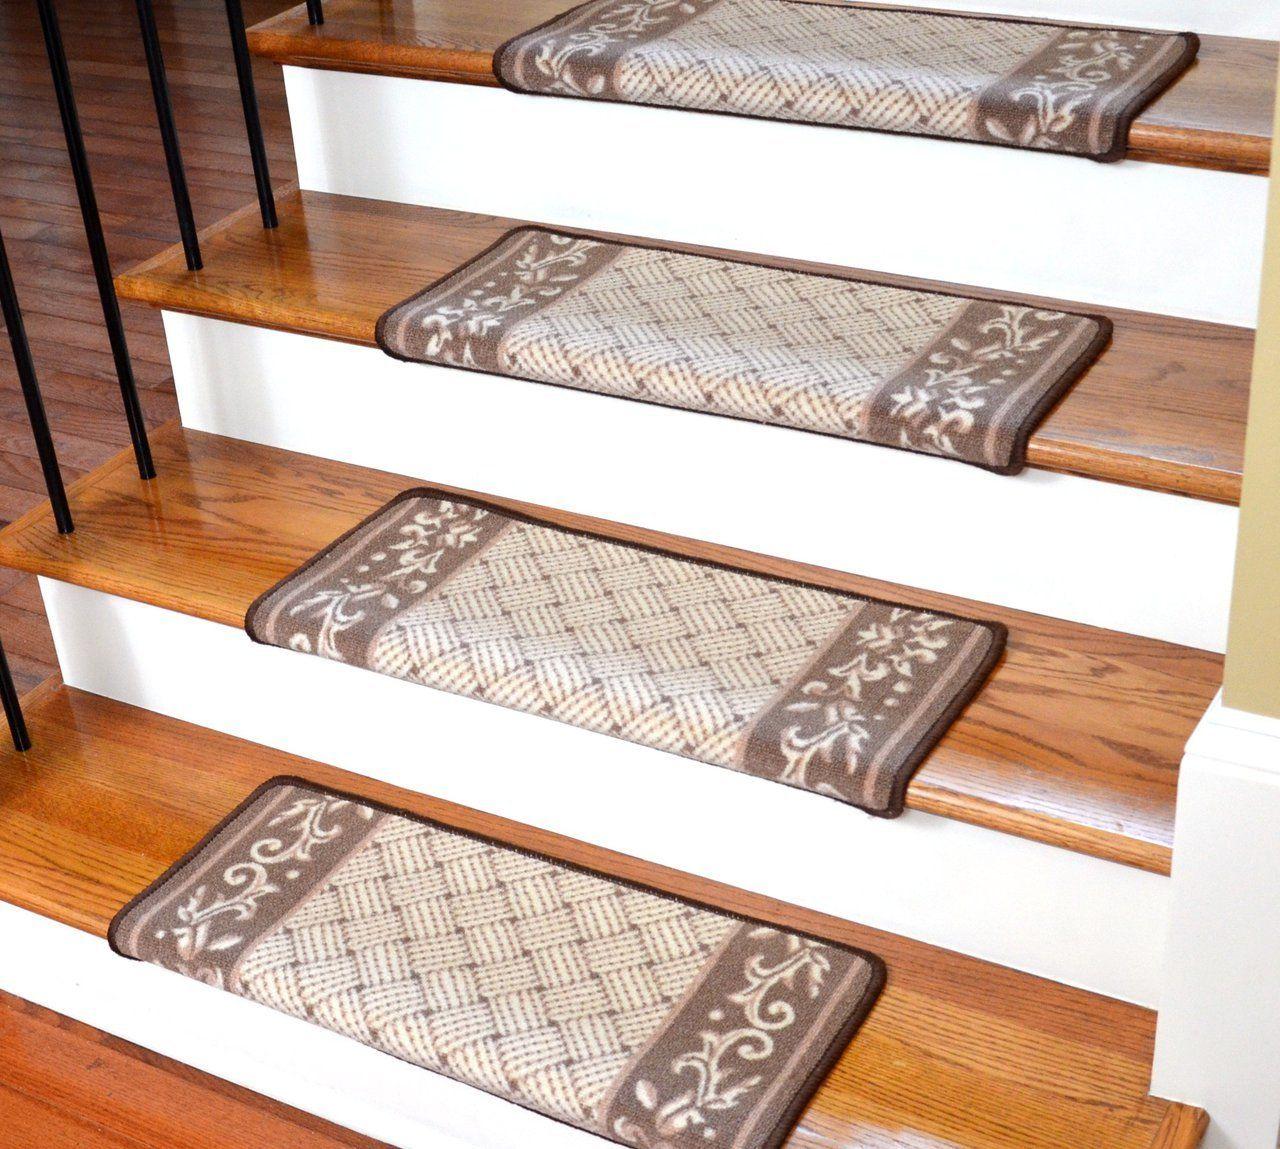 Dean Diy Bullnose Carpet Stair Treads Set Of 13 Stairs Design | Dean Carpet Stair Treads | Pet Friendly | Gripper Tape | Friendly Diy | Rug | Modern Diy